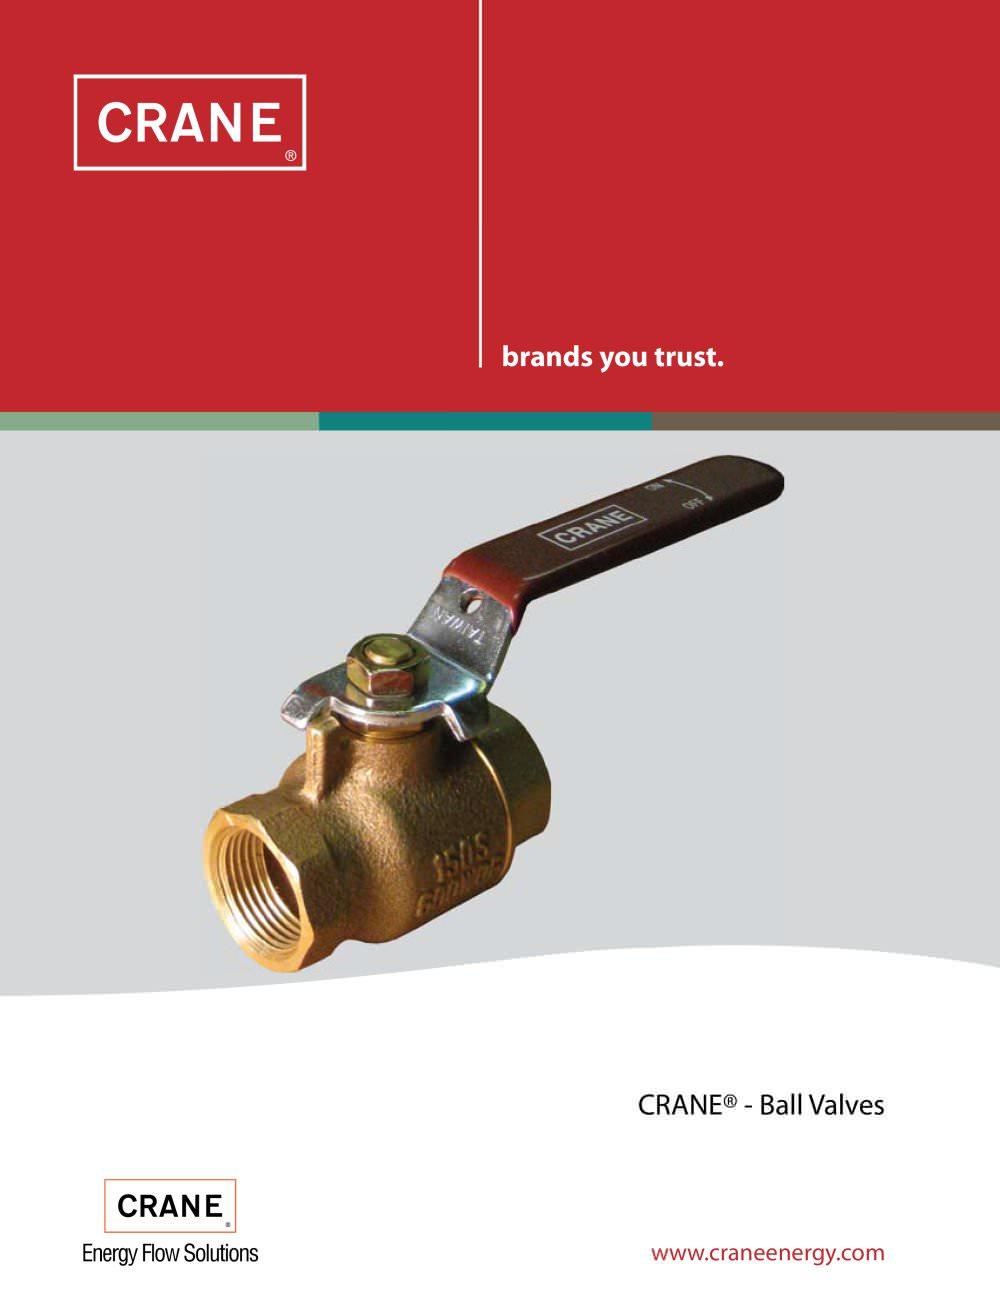 Crane ball valve crane process flow technologies gmbh pdf crane ball valve 1 16 pages ccuart Image collections